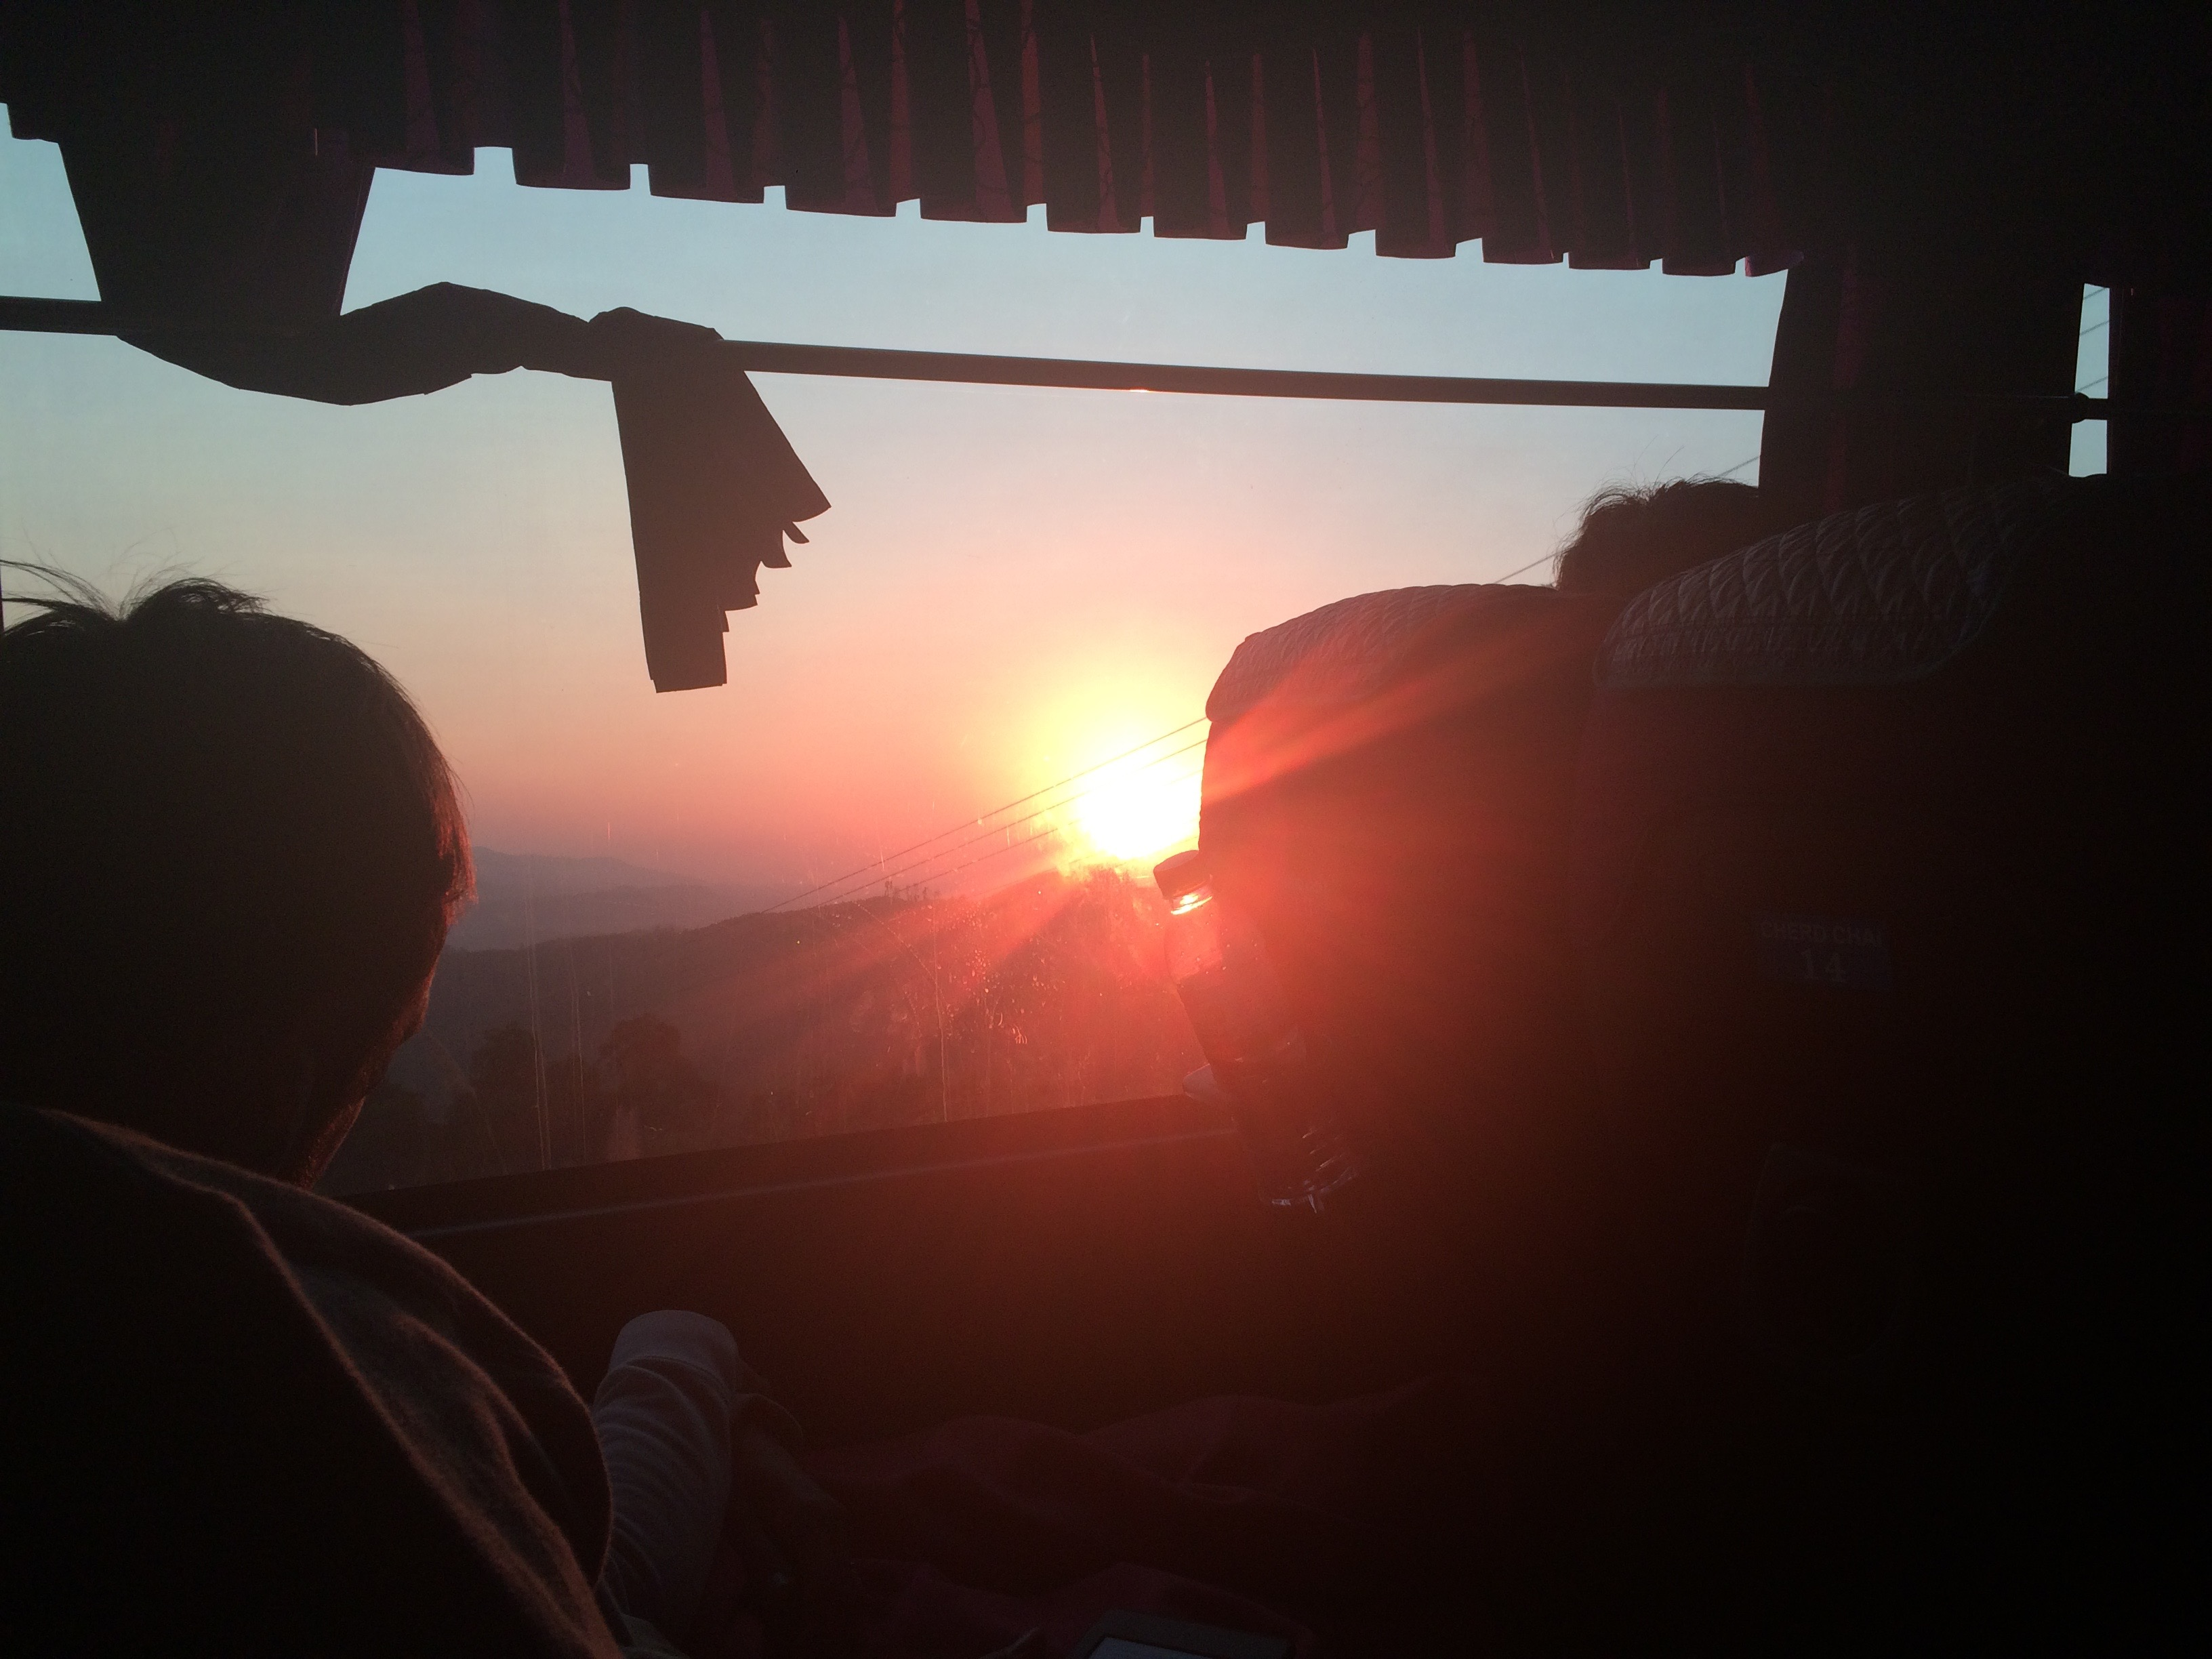 Fim de tarde lindo dentro do ônibus... (Foto: Nathalia Tavolieri)